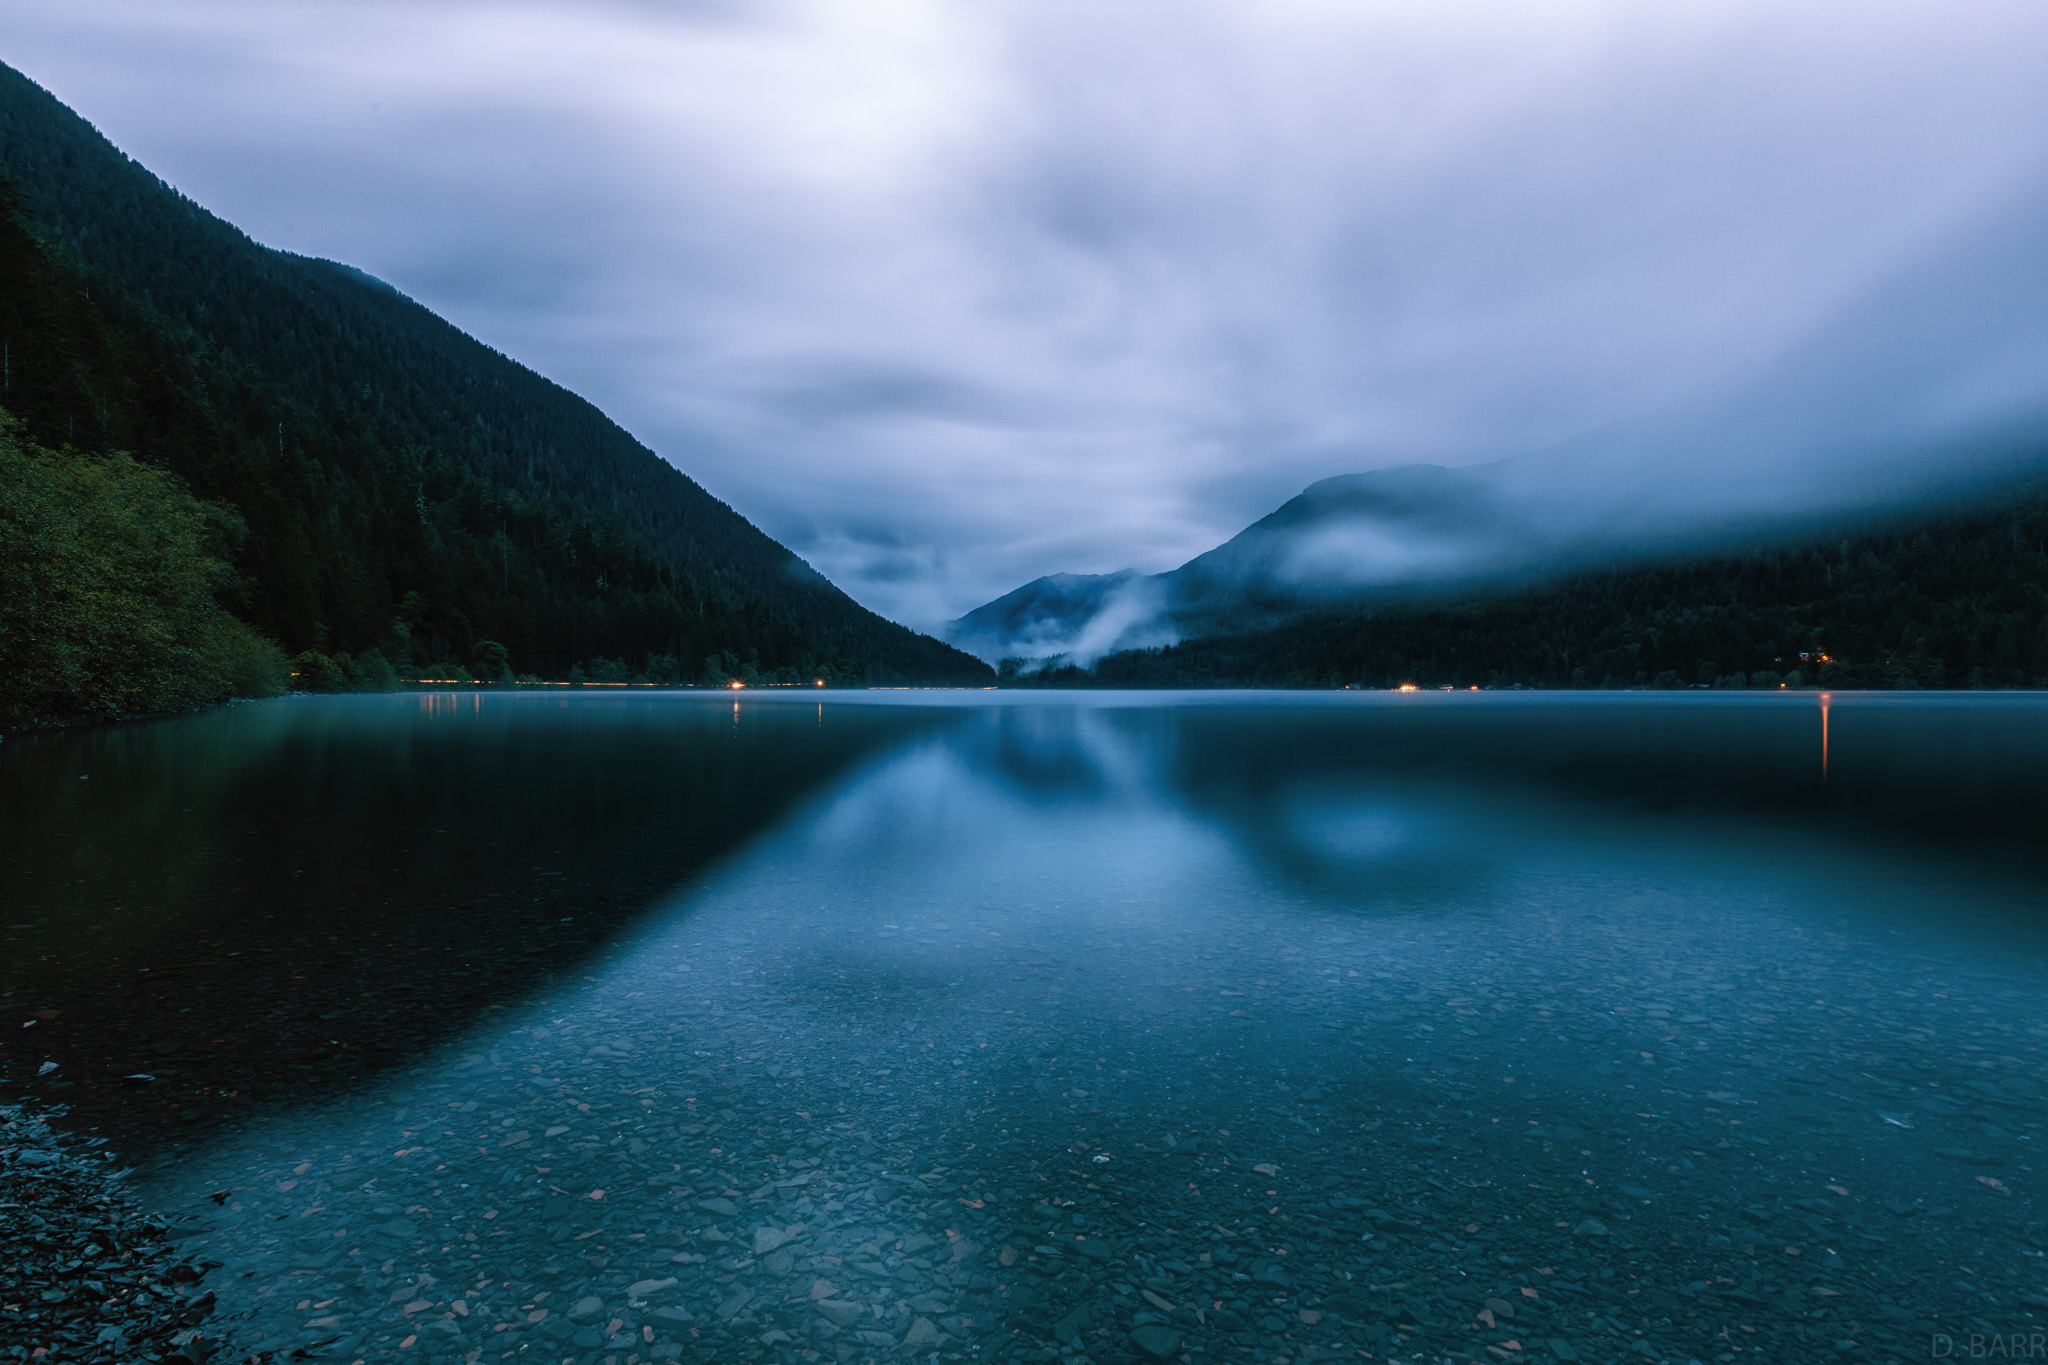 Crescent Lake, Washington